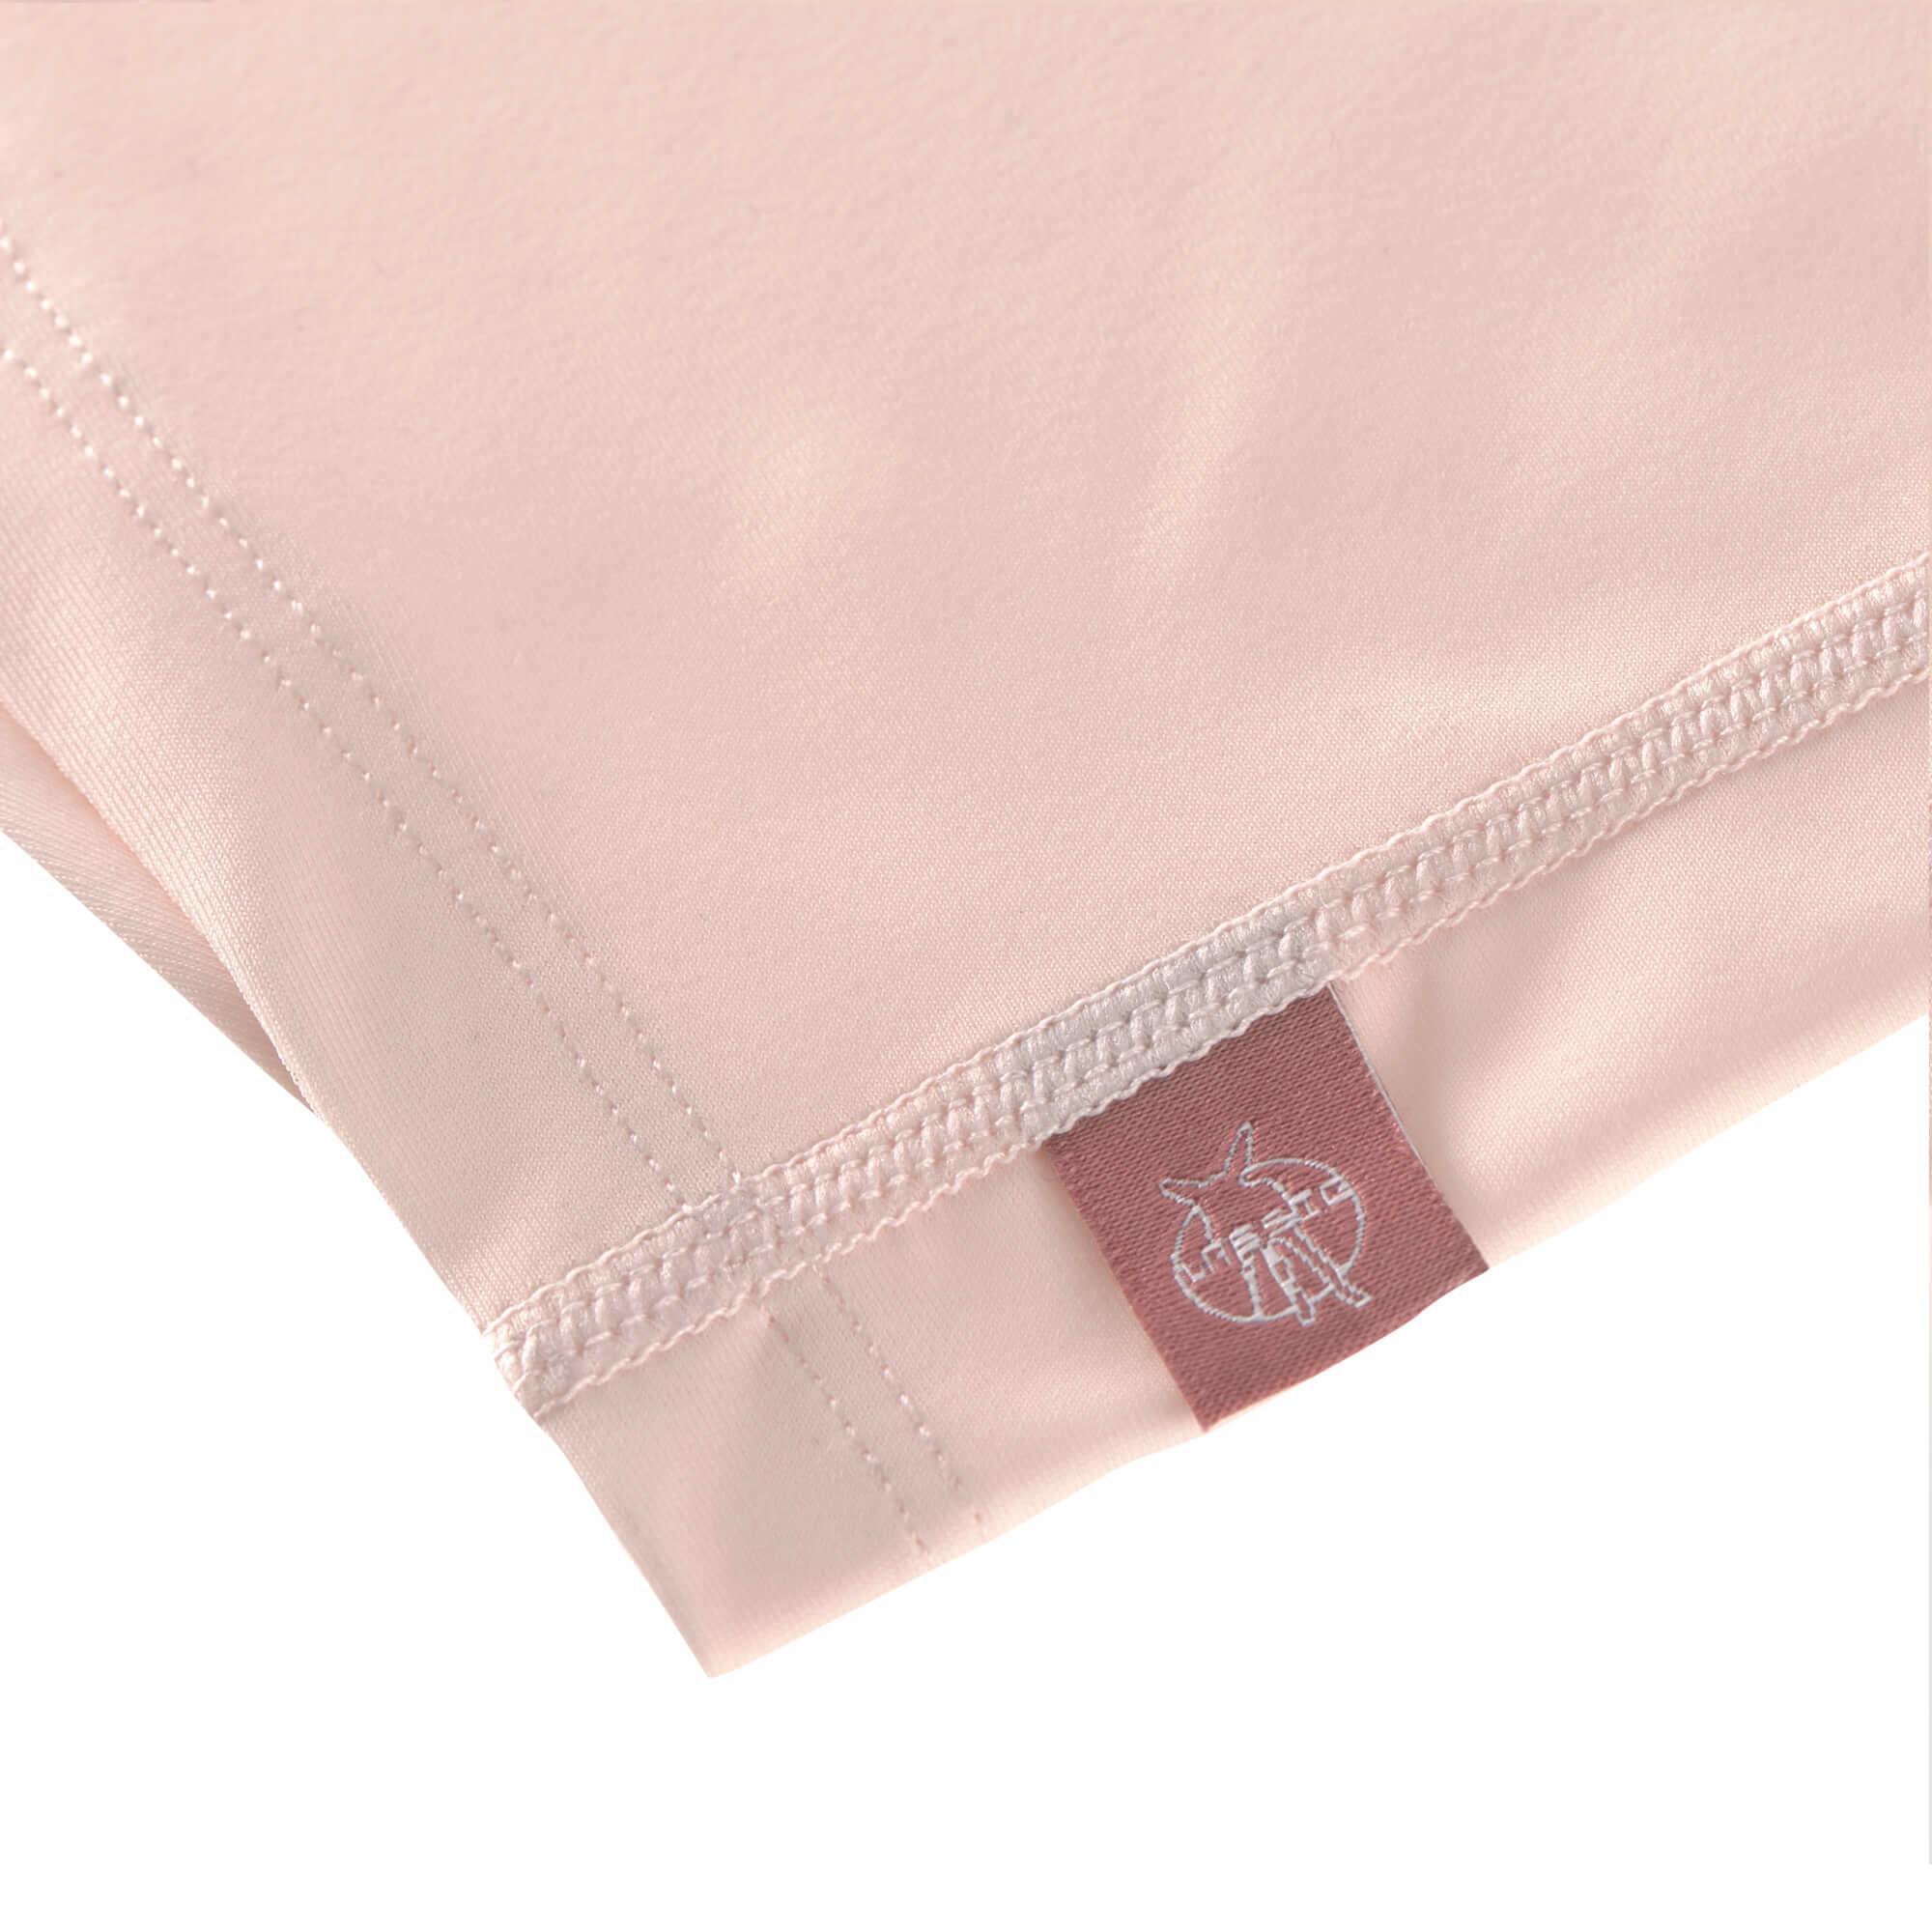 Lässig Lässig Splash & Fun Korte mouw Rashguard UV zwemshirt – Rainbow rose